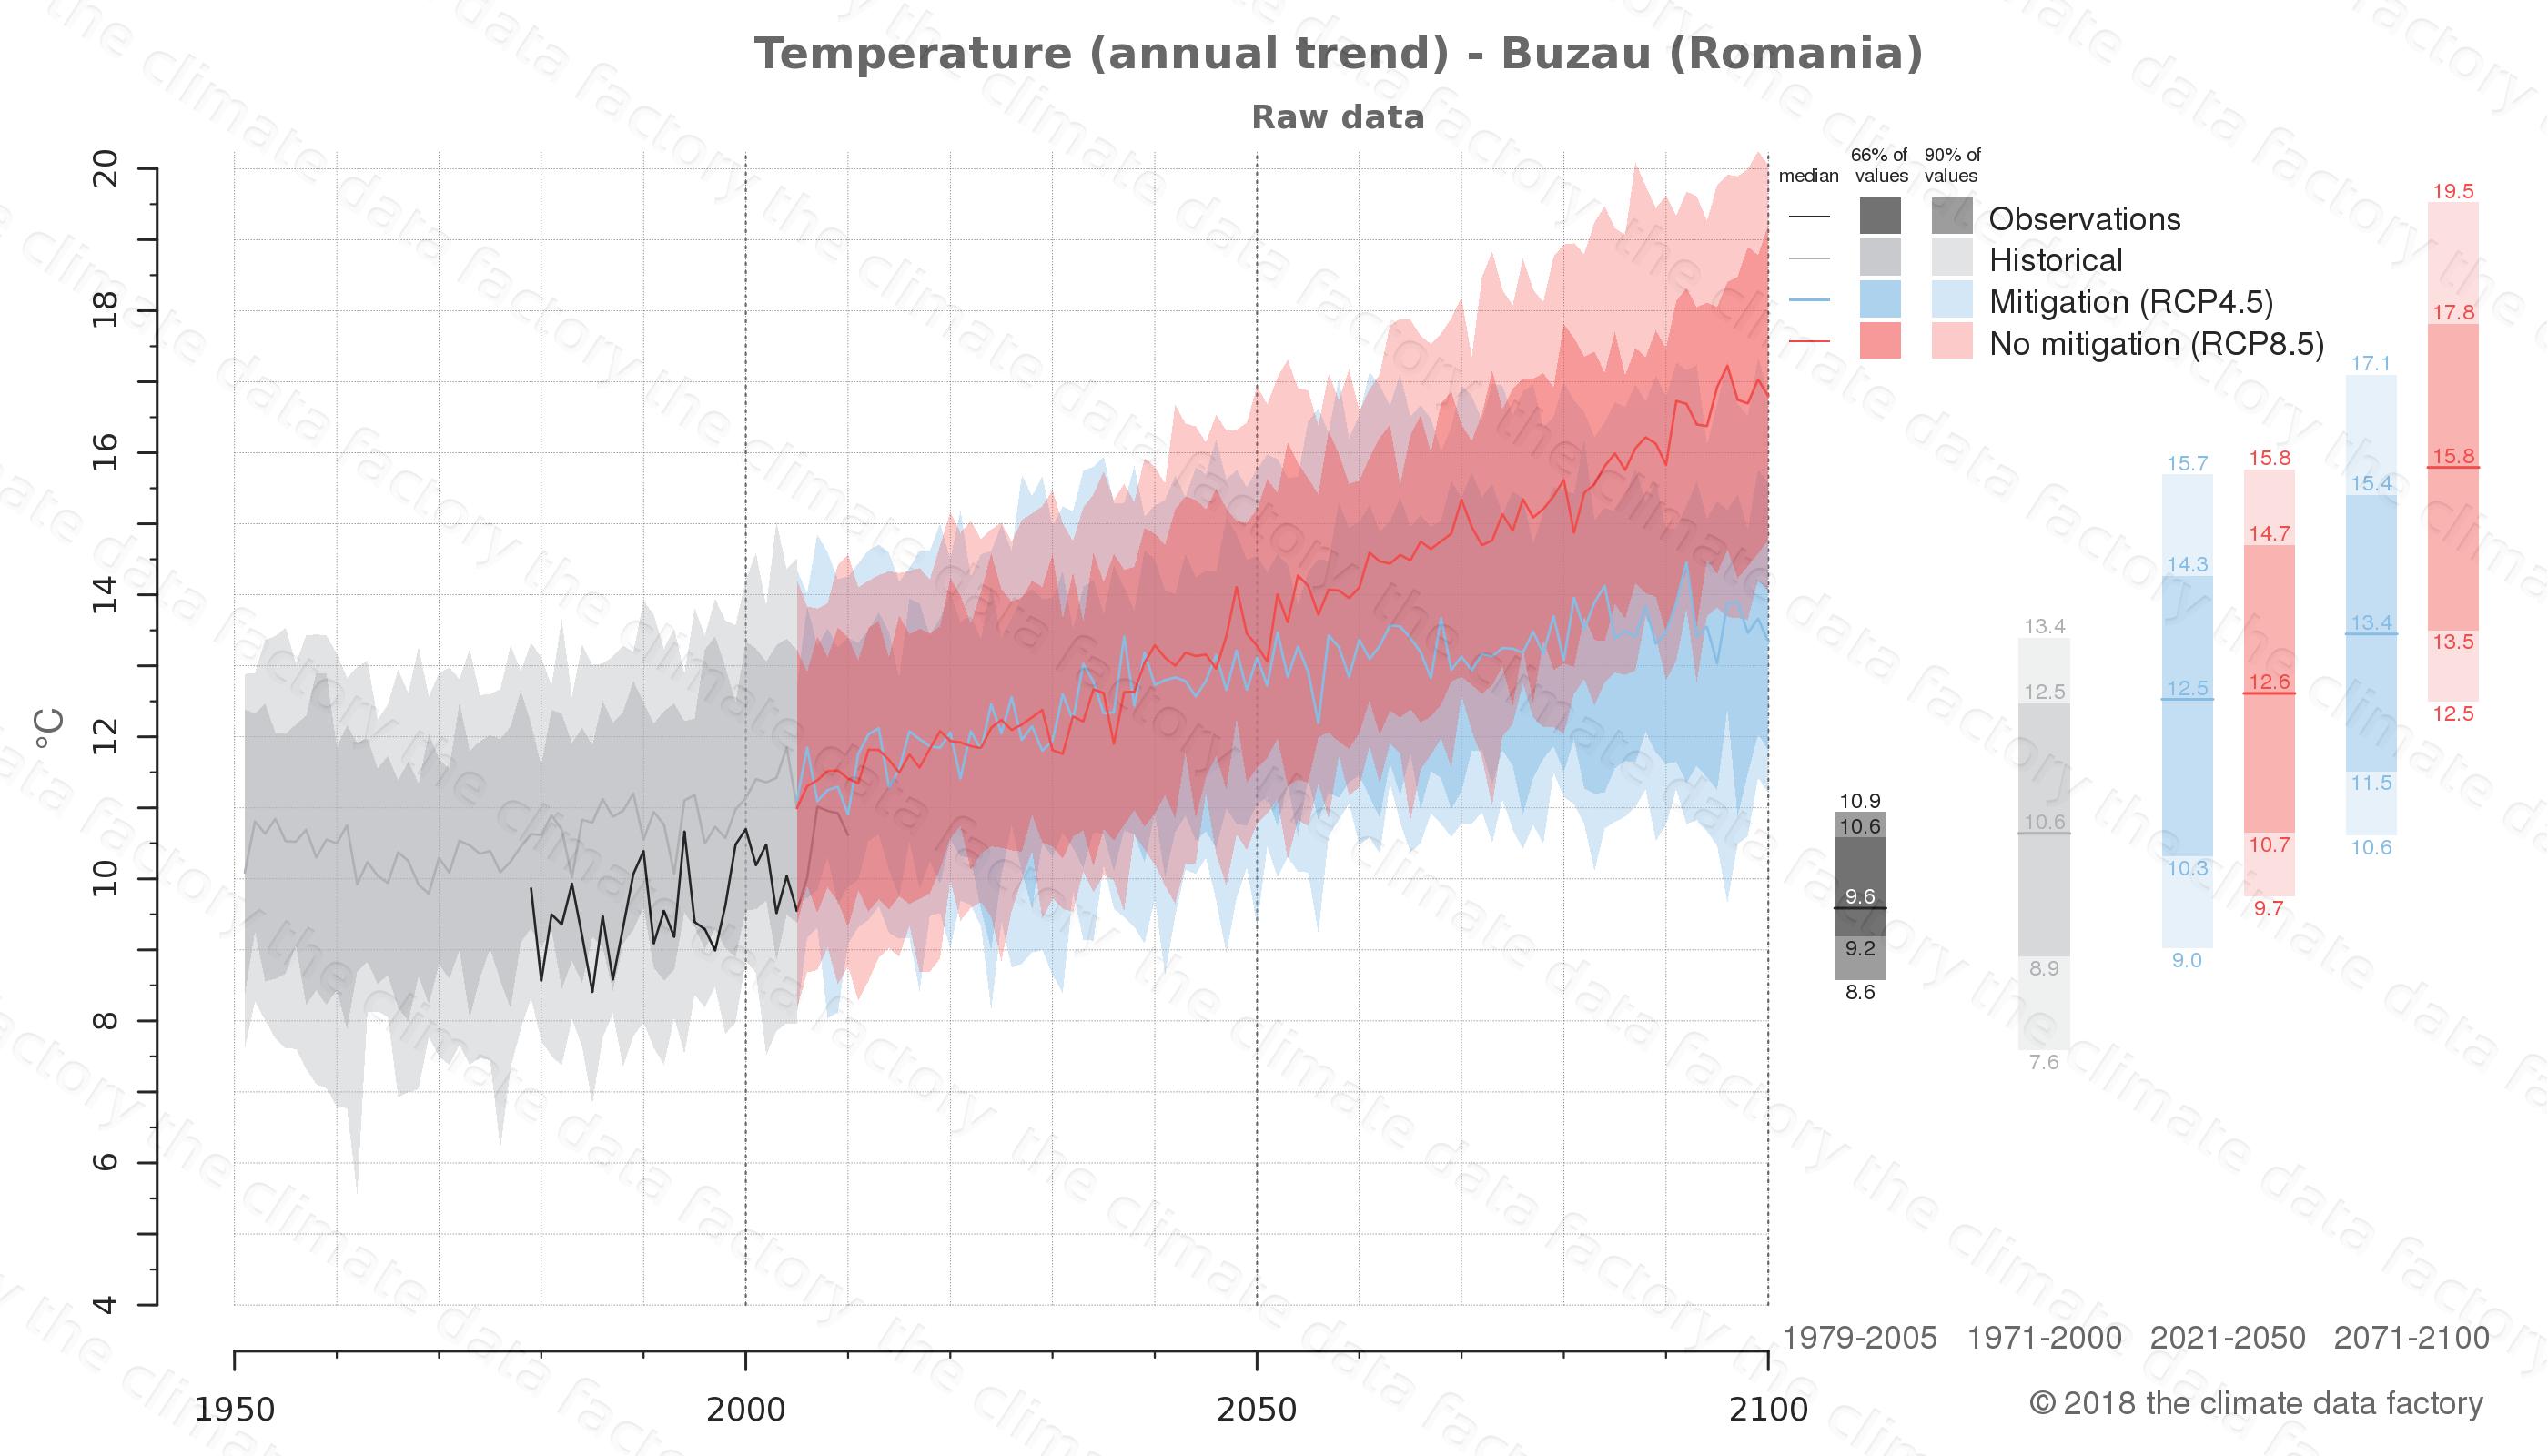 climate change data policy adaptation climate graph city data temperature buzau romania